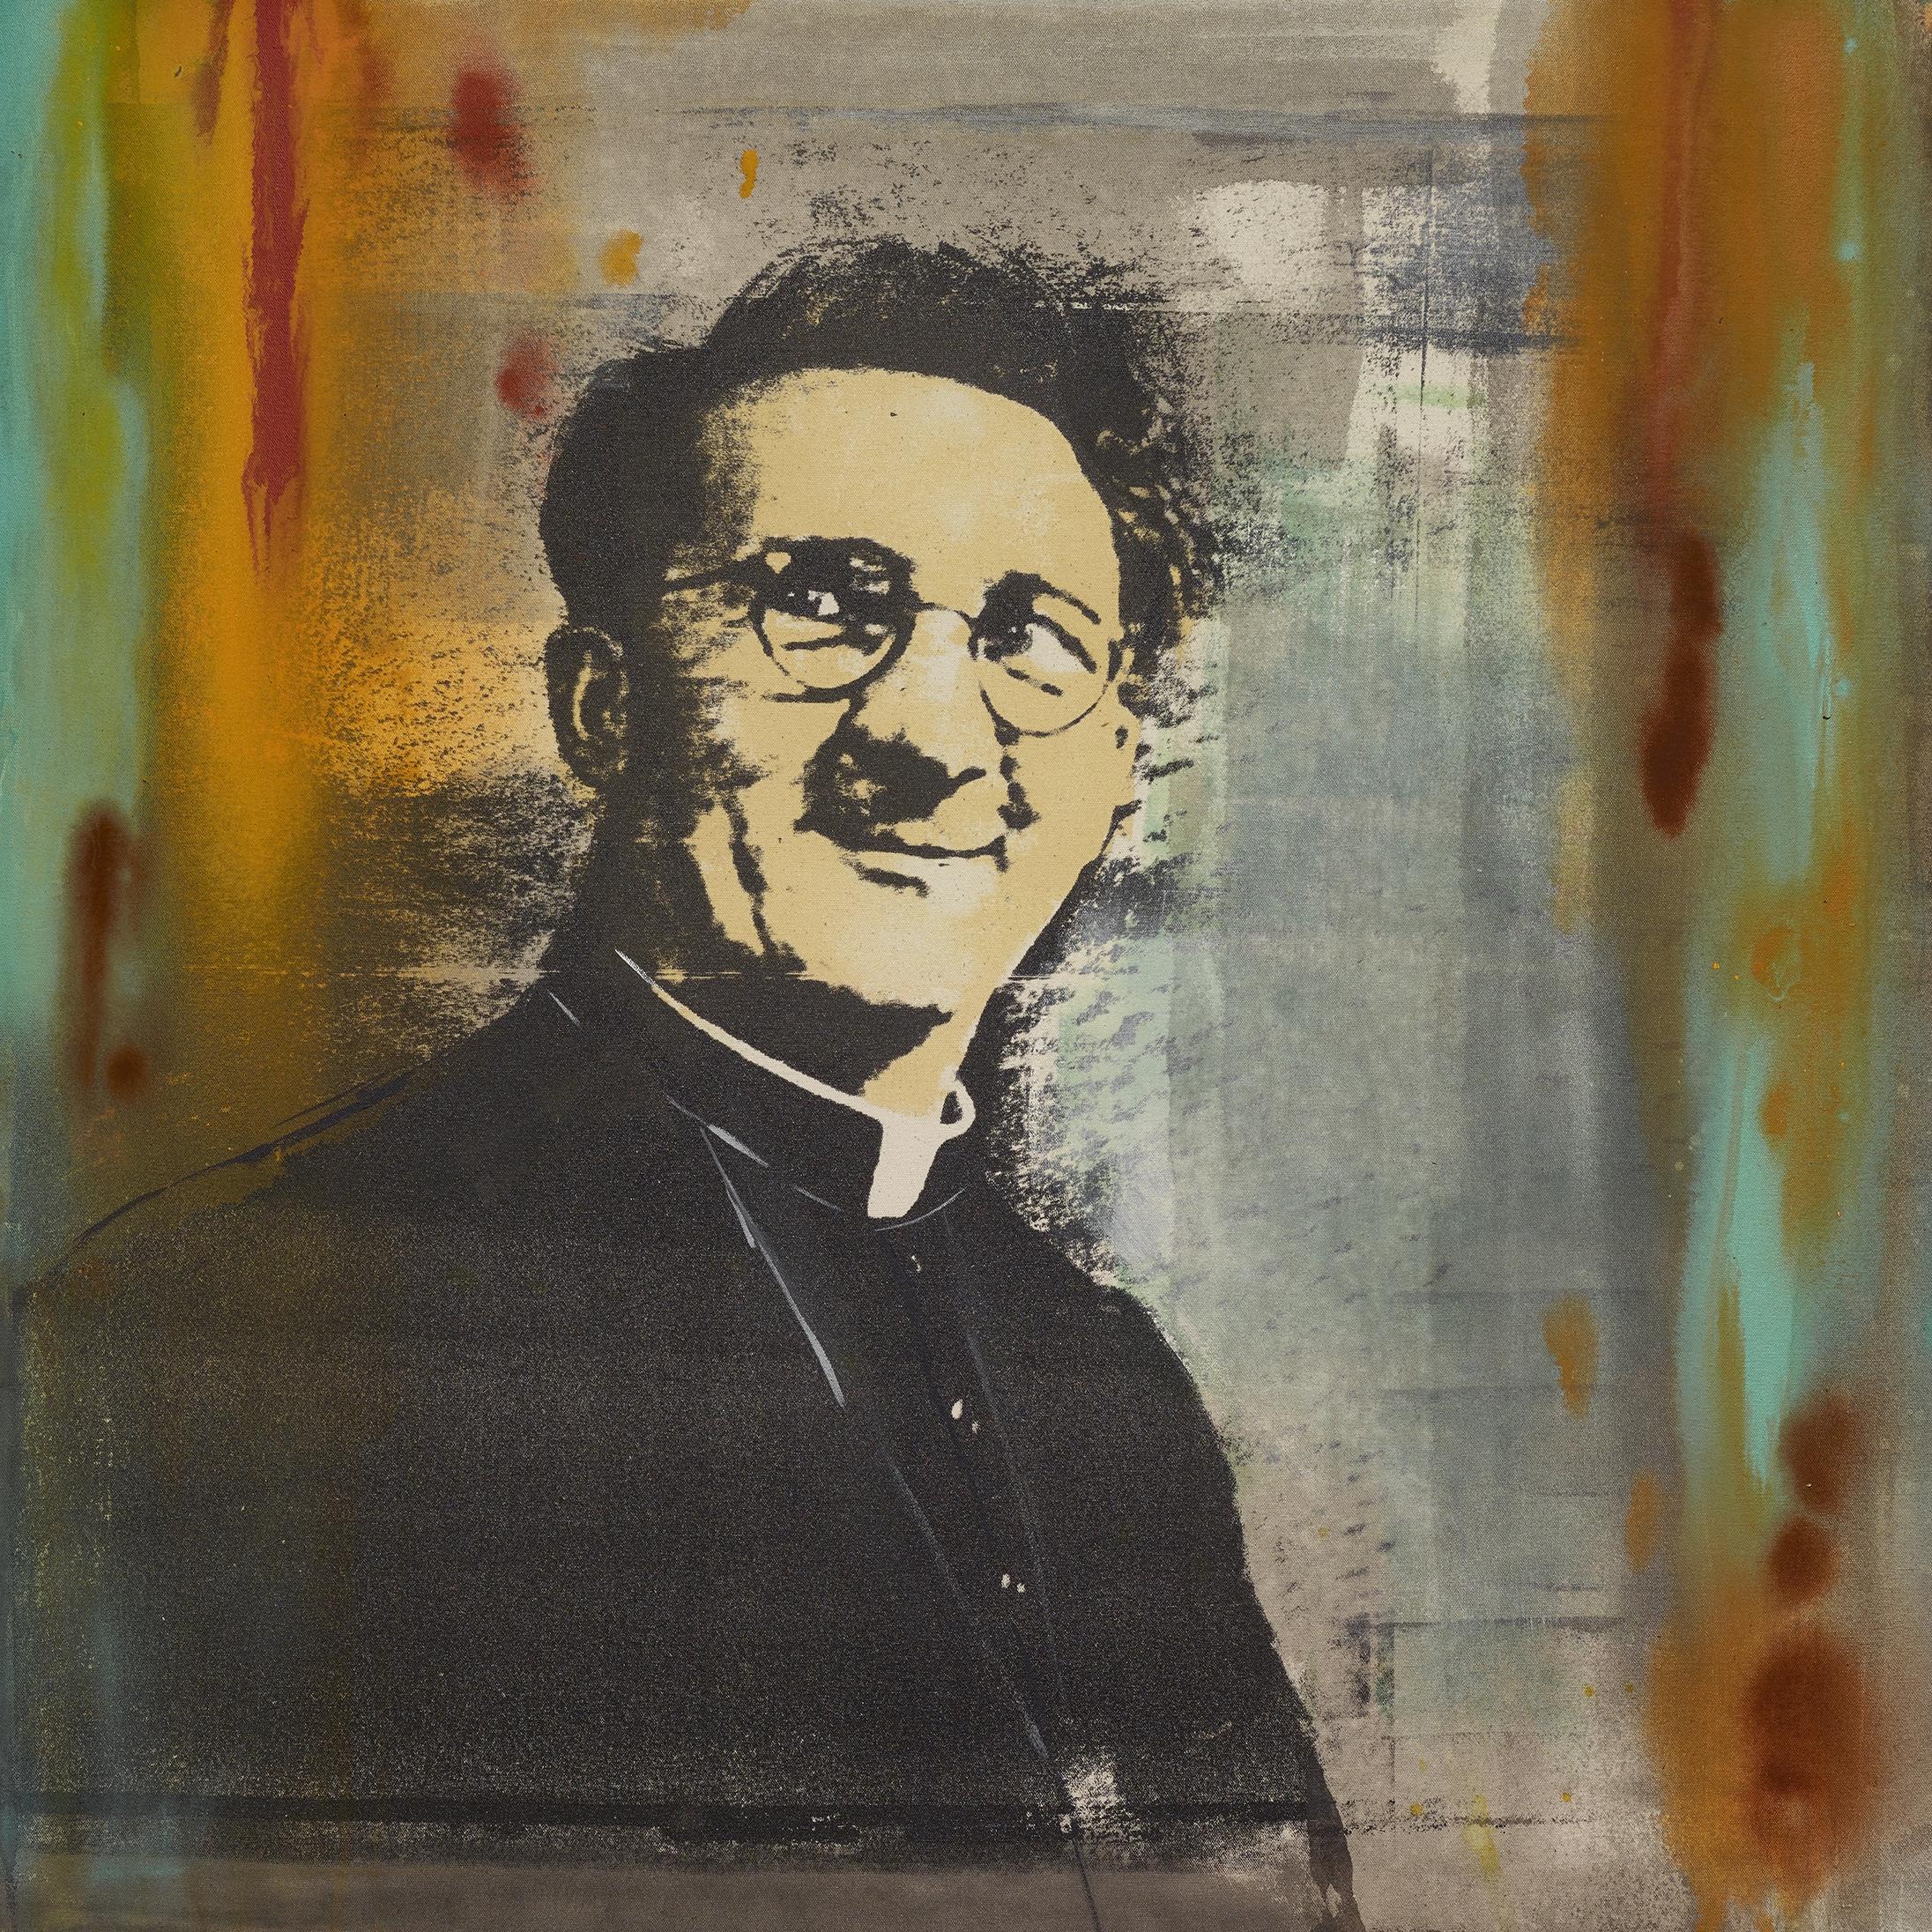 Rev. Hugh O'Flaherty